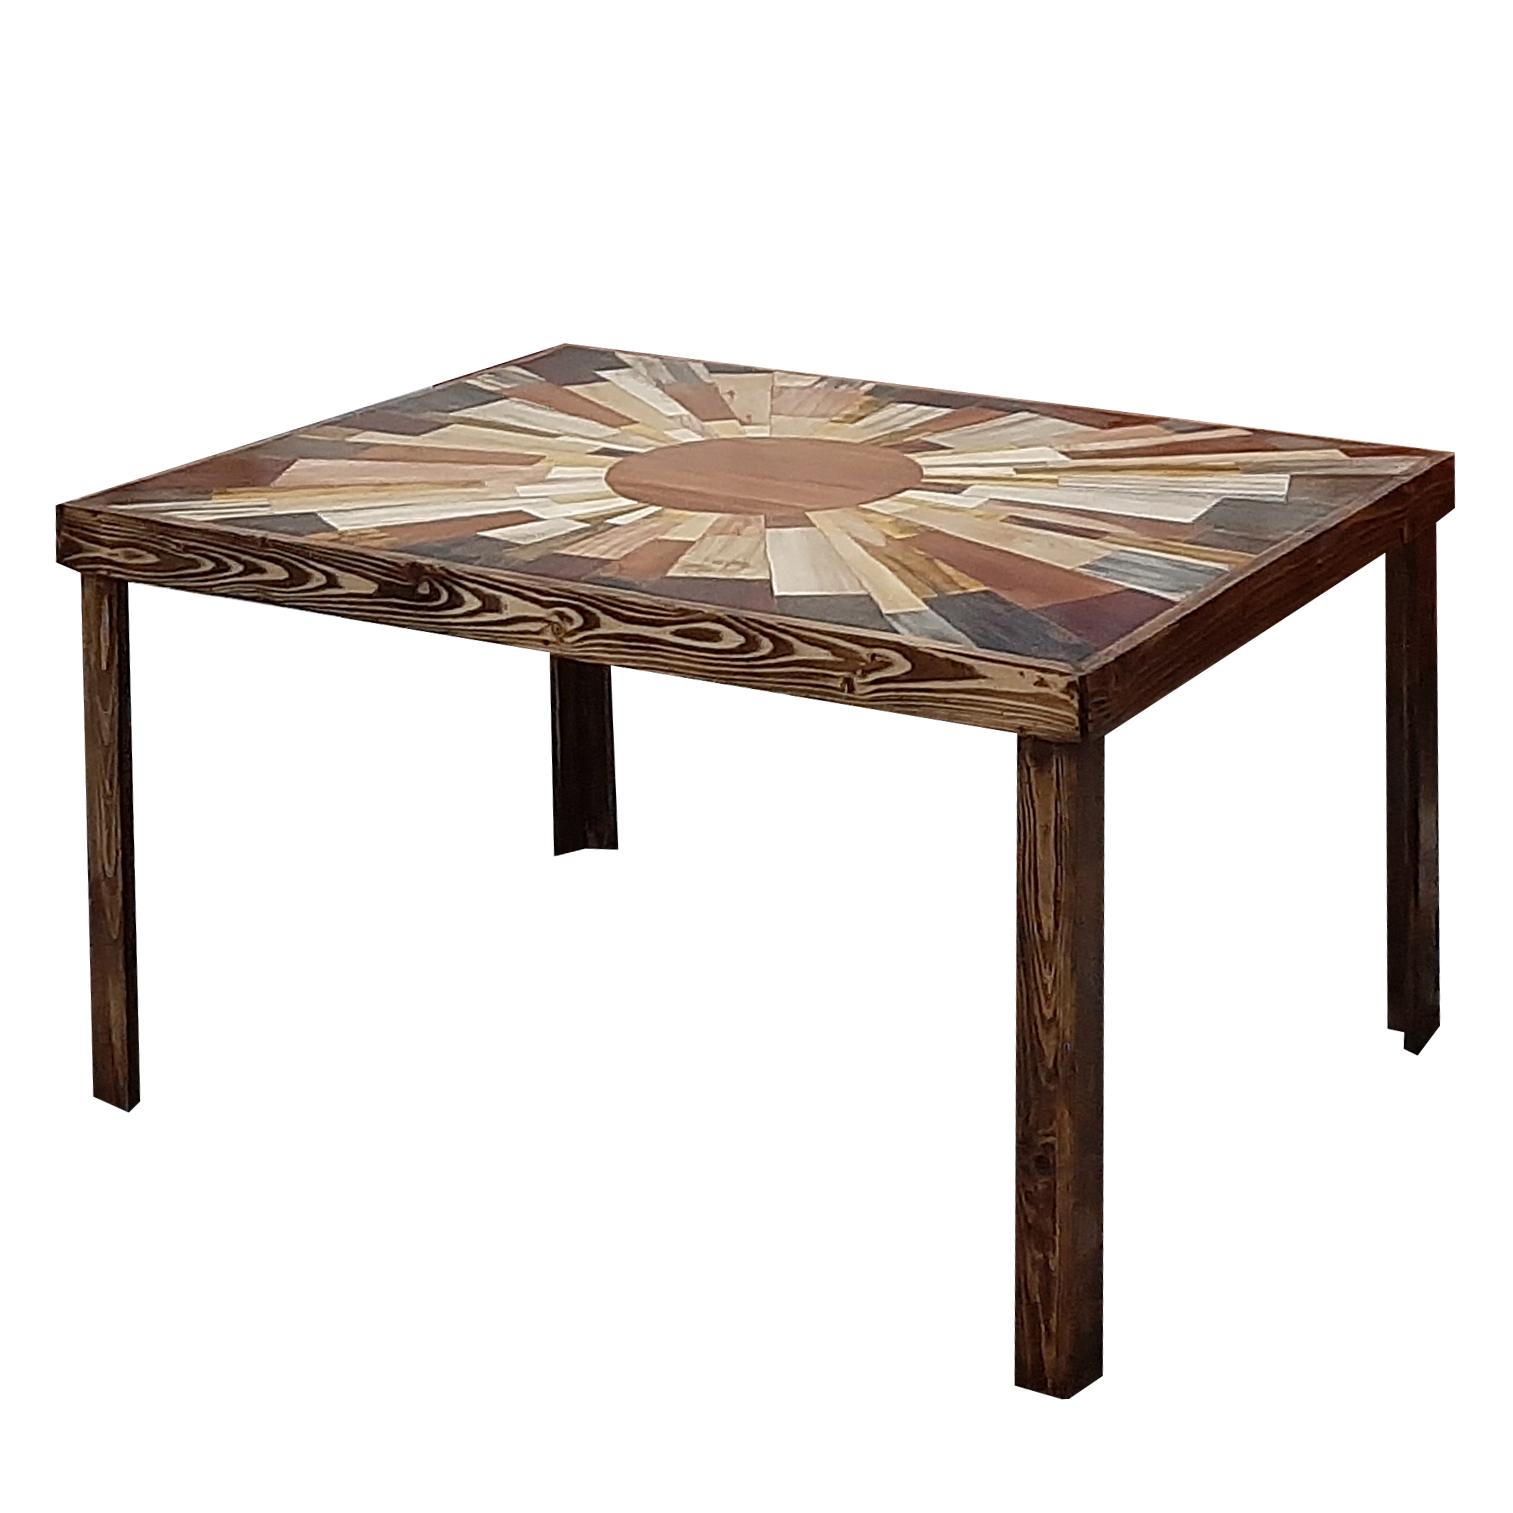 میز جلو مبلی مدل خورشید کد 3